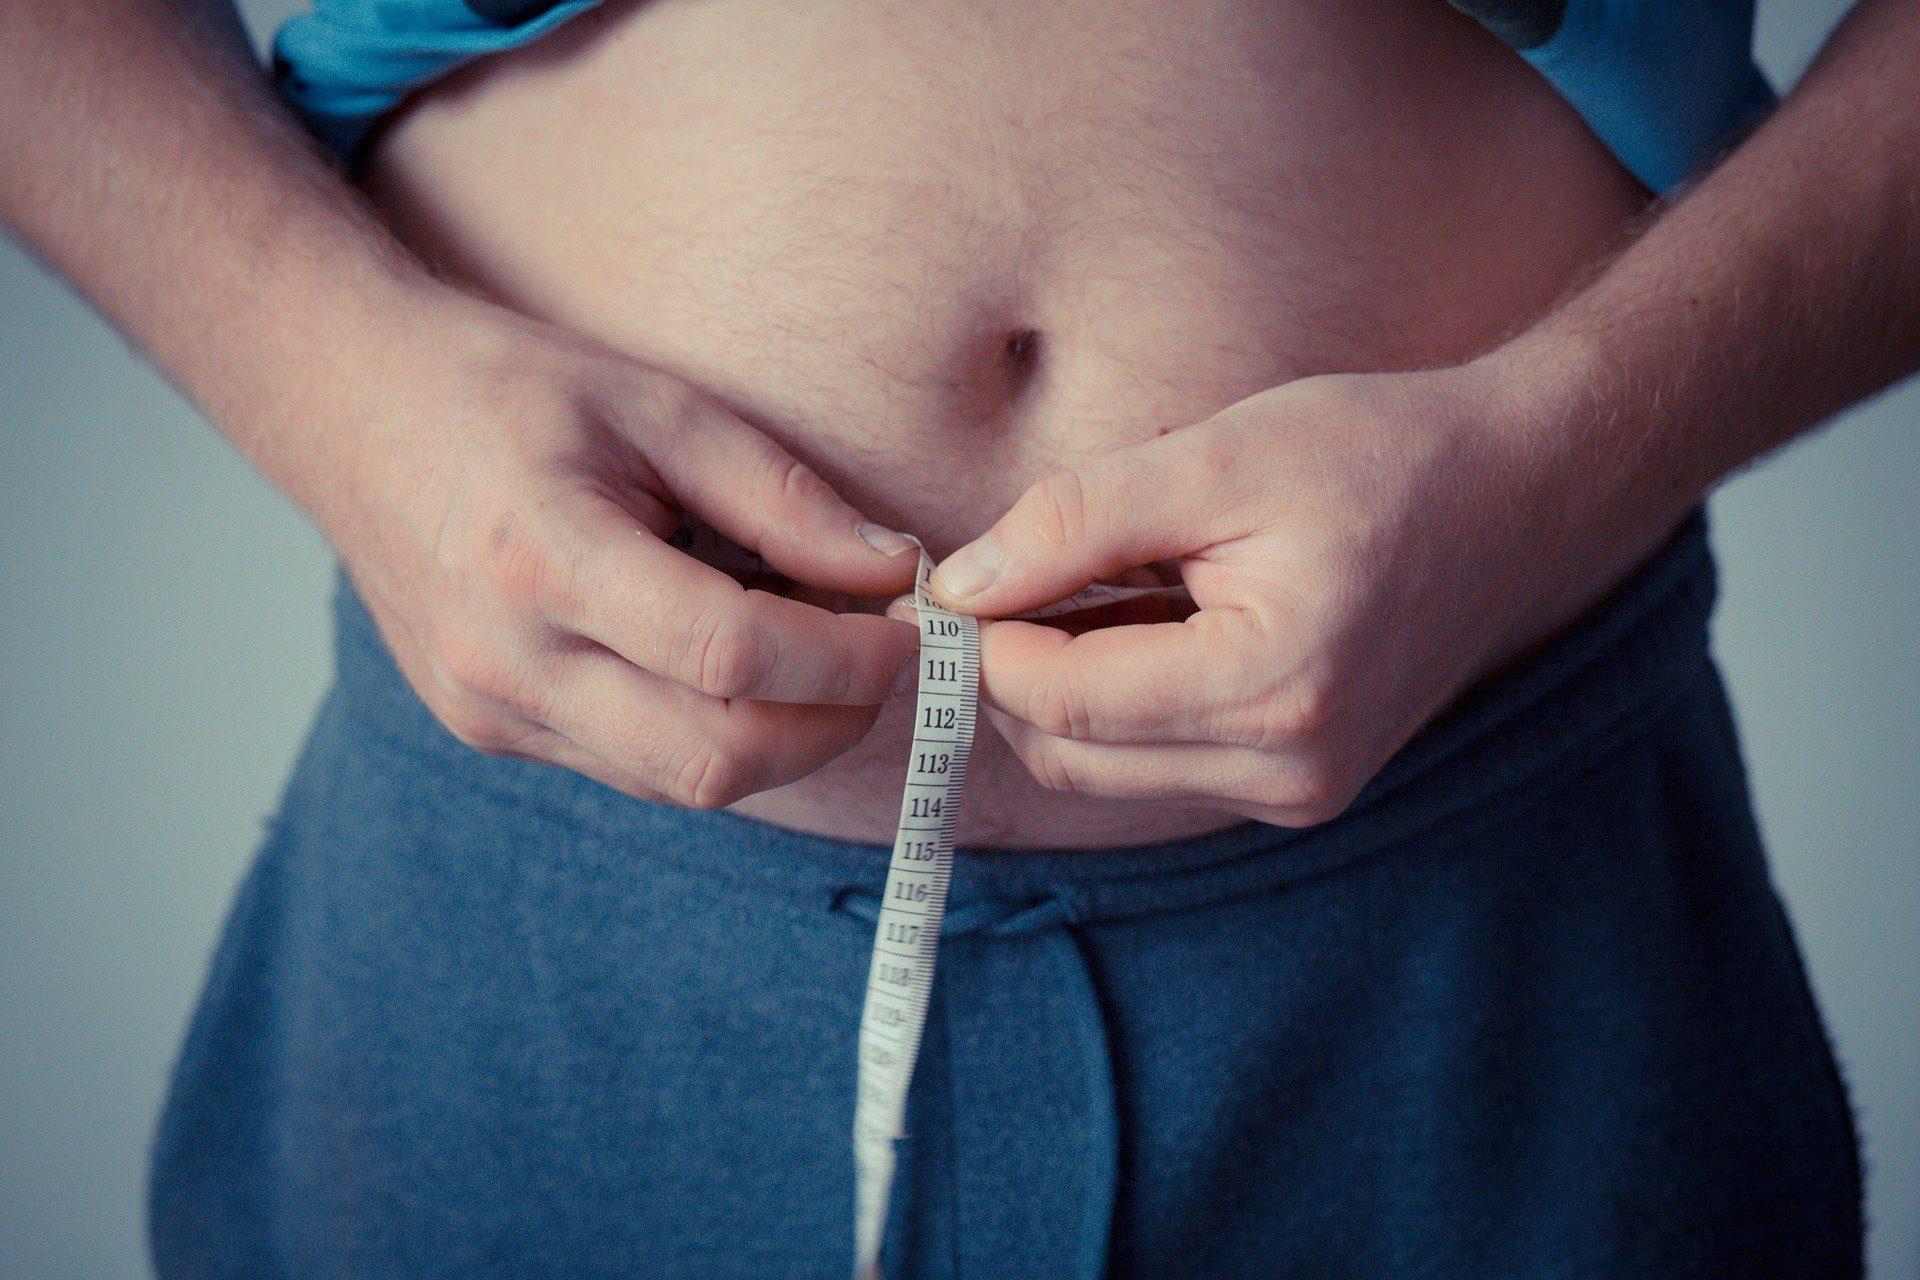 Obesidade e sobrepeso